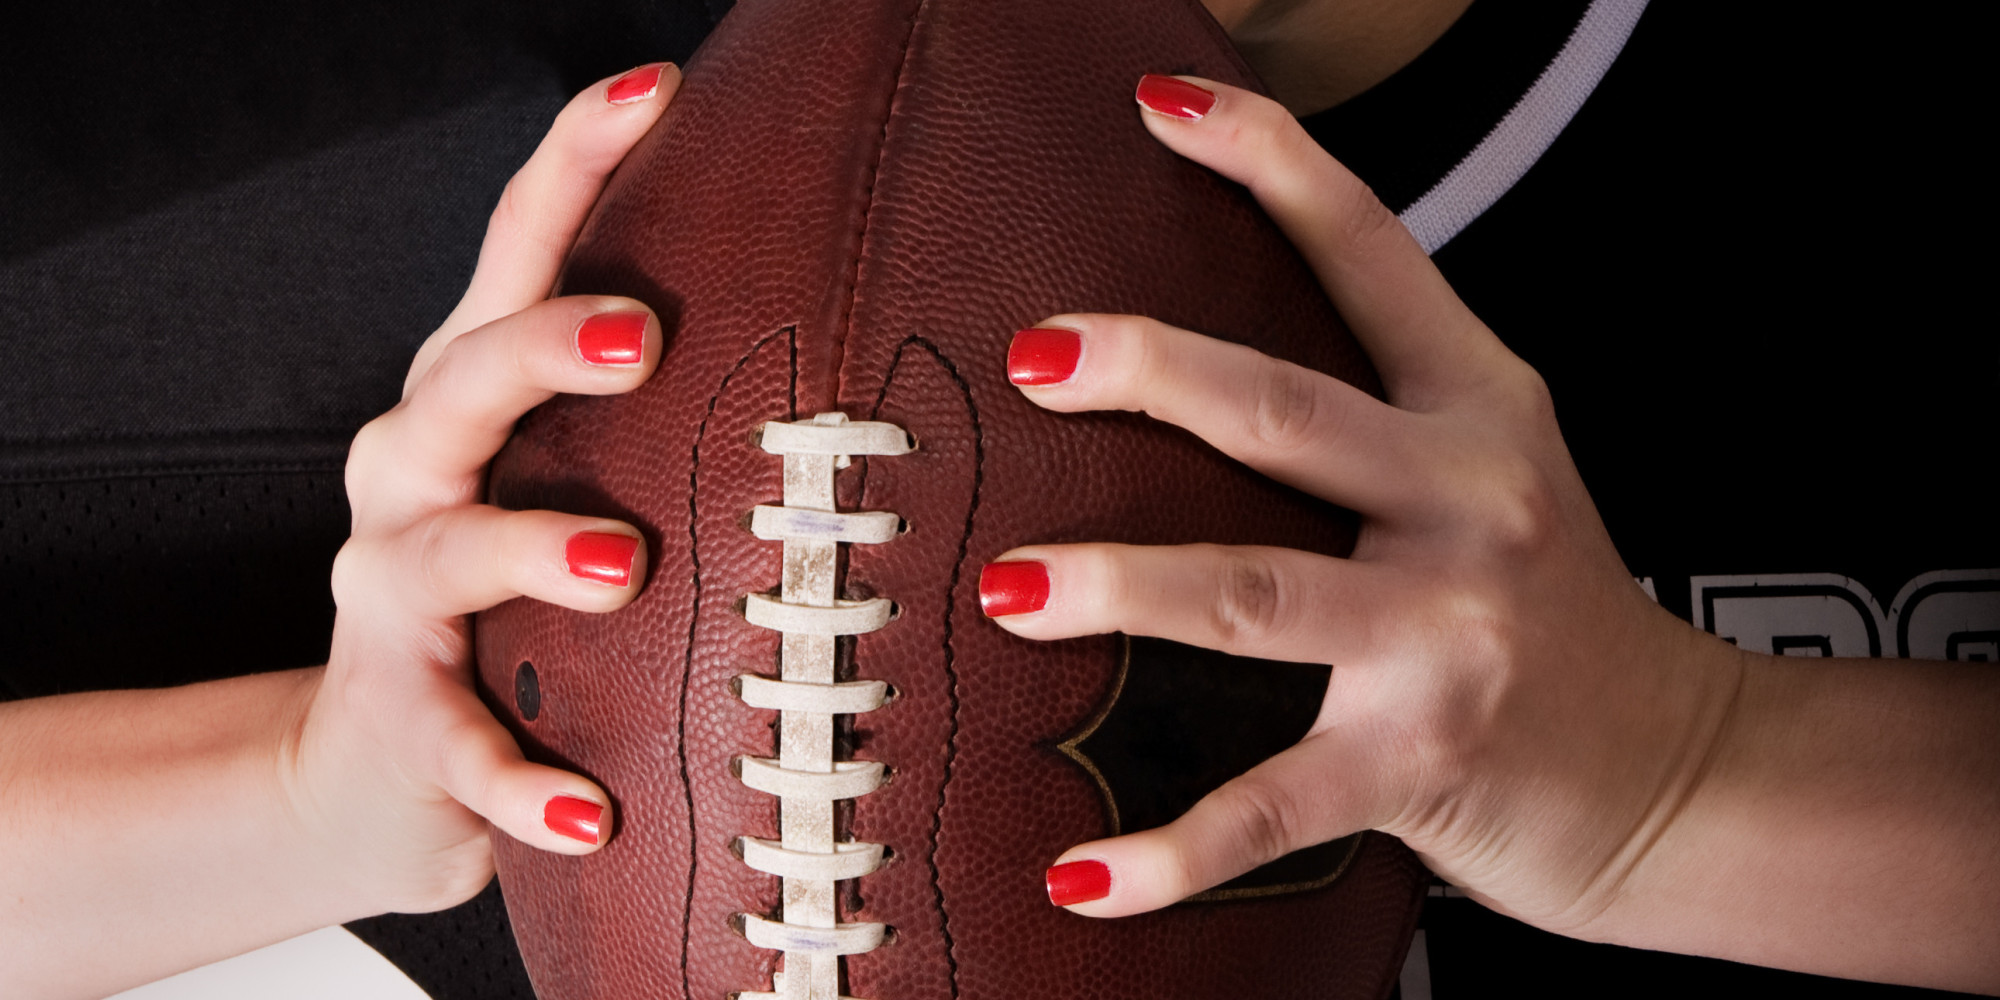 Women against fantasy sports